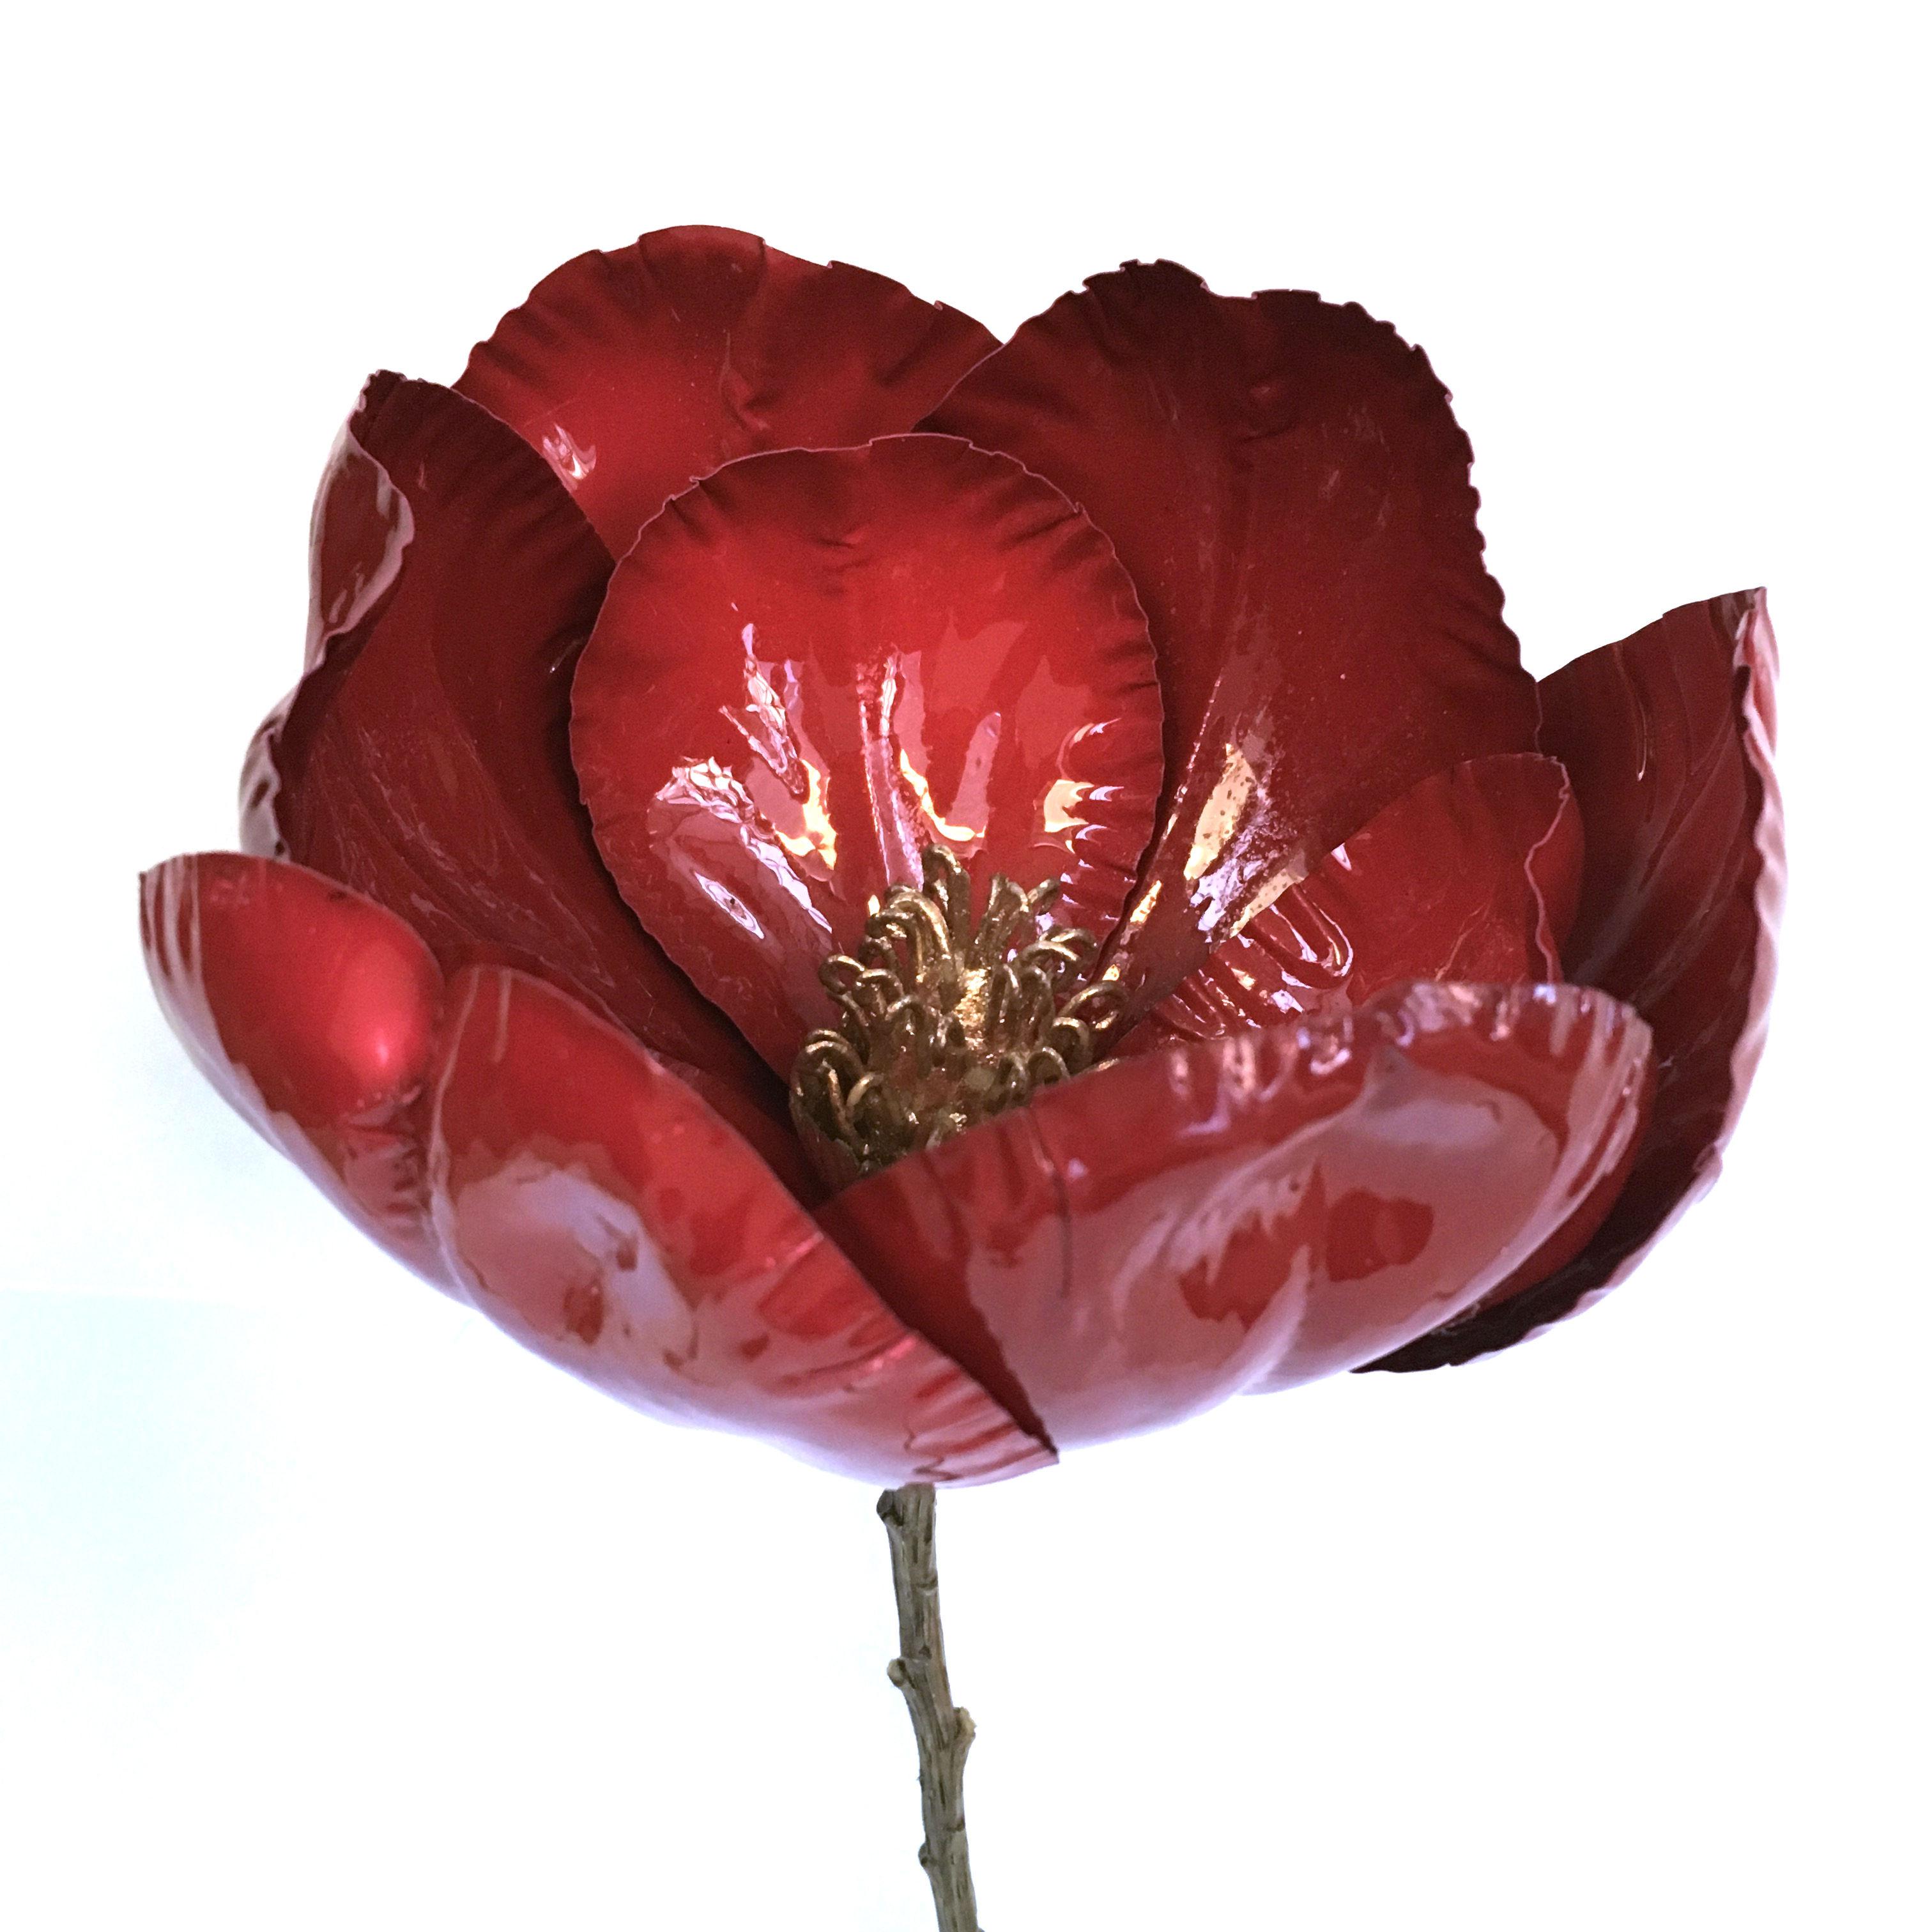 16857_magnolia_porselen_roed1